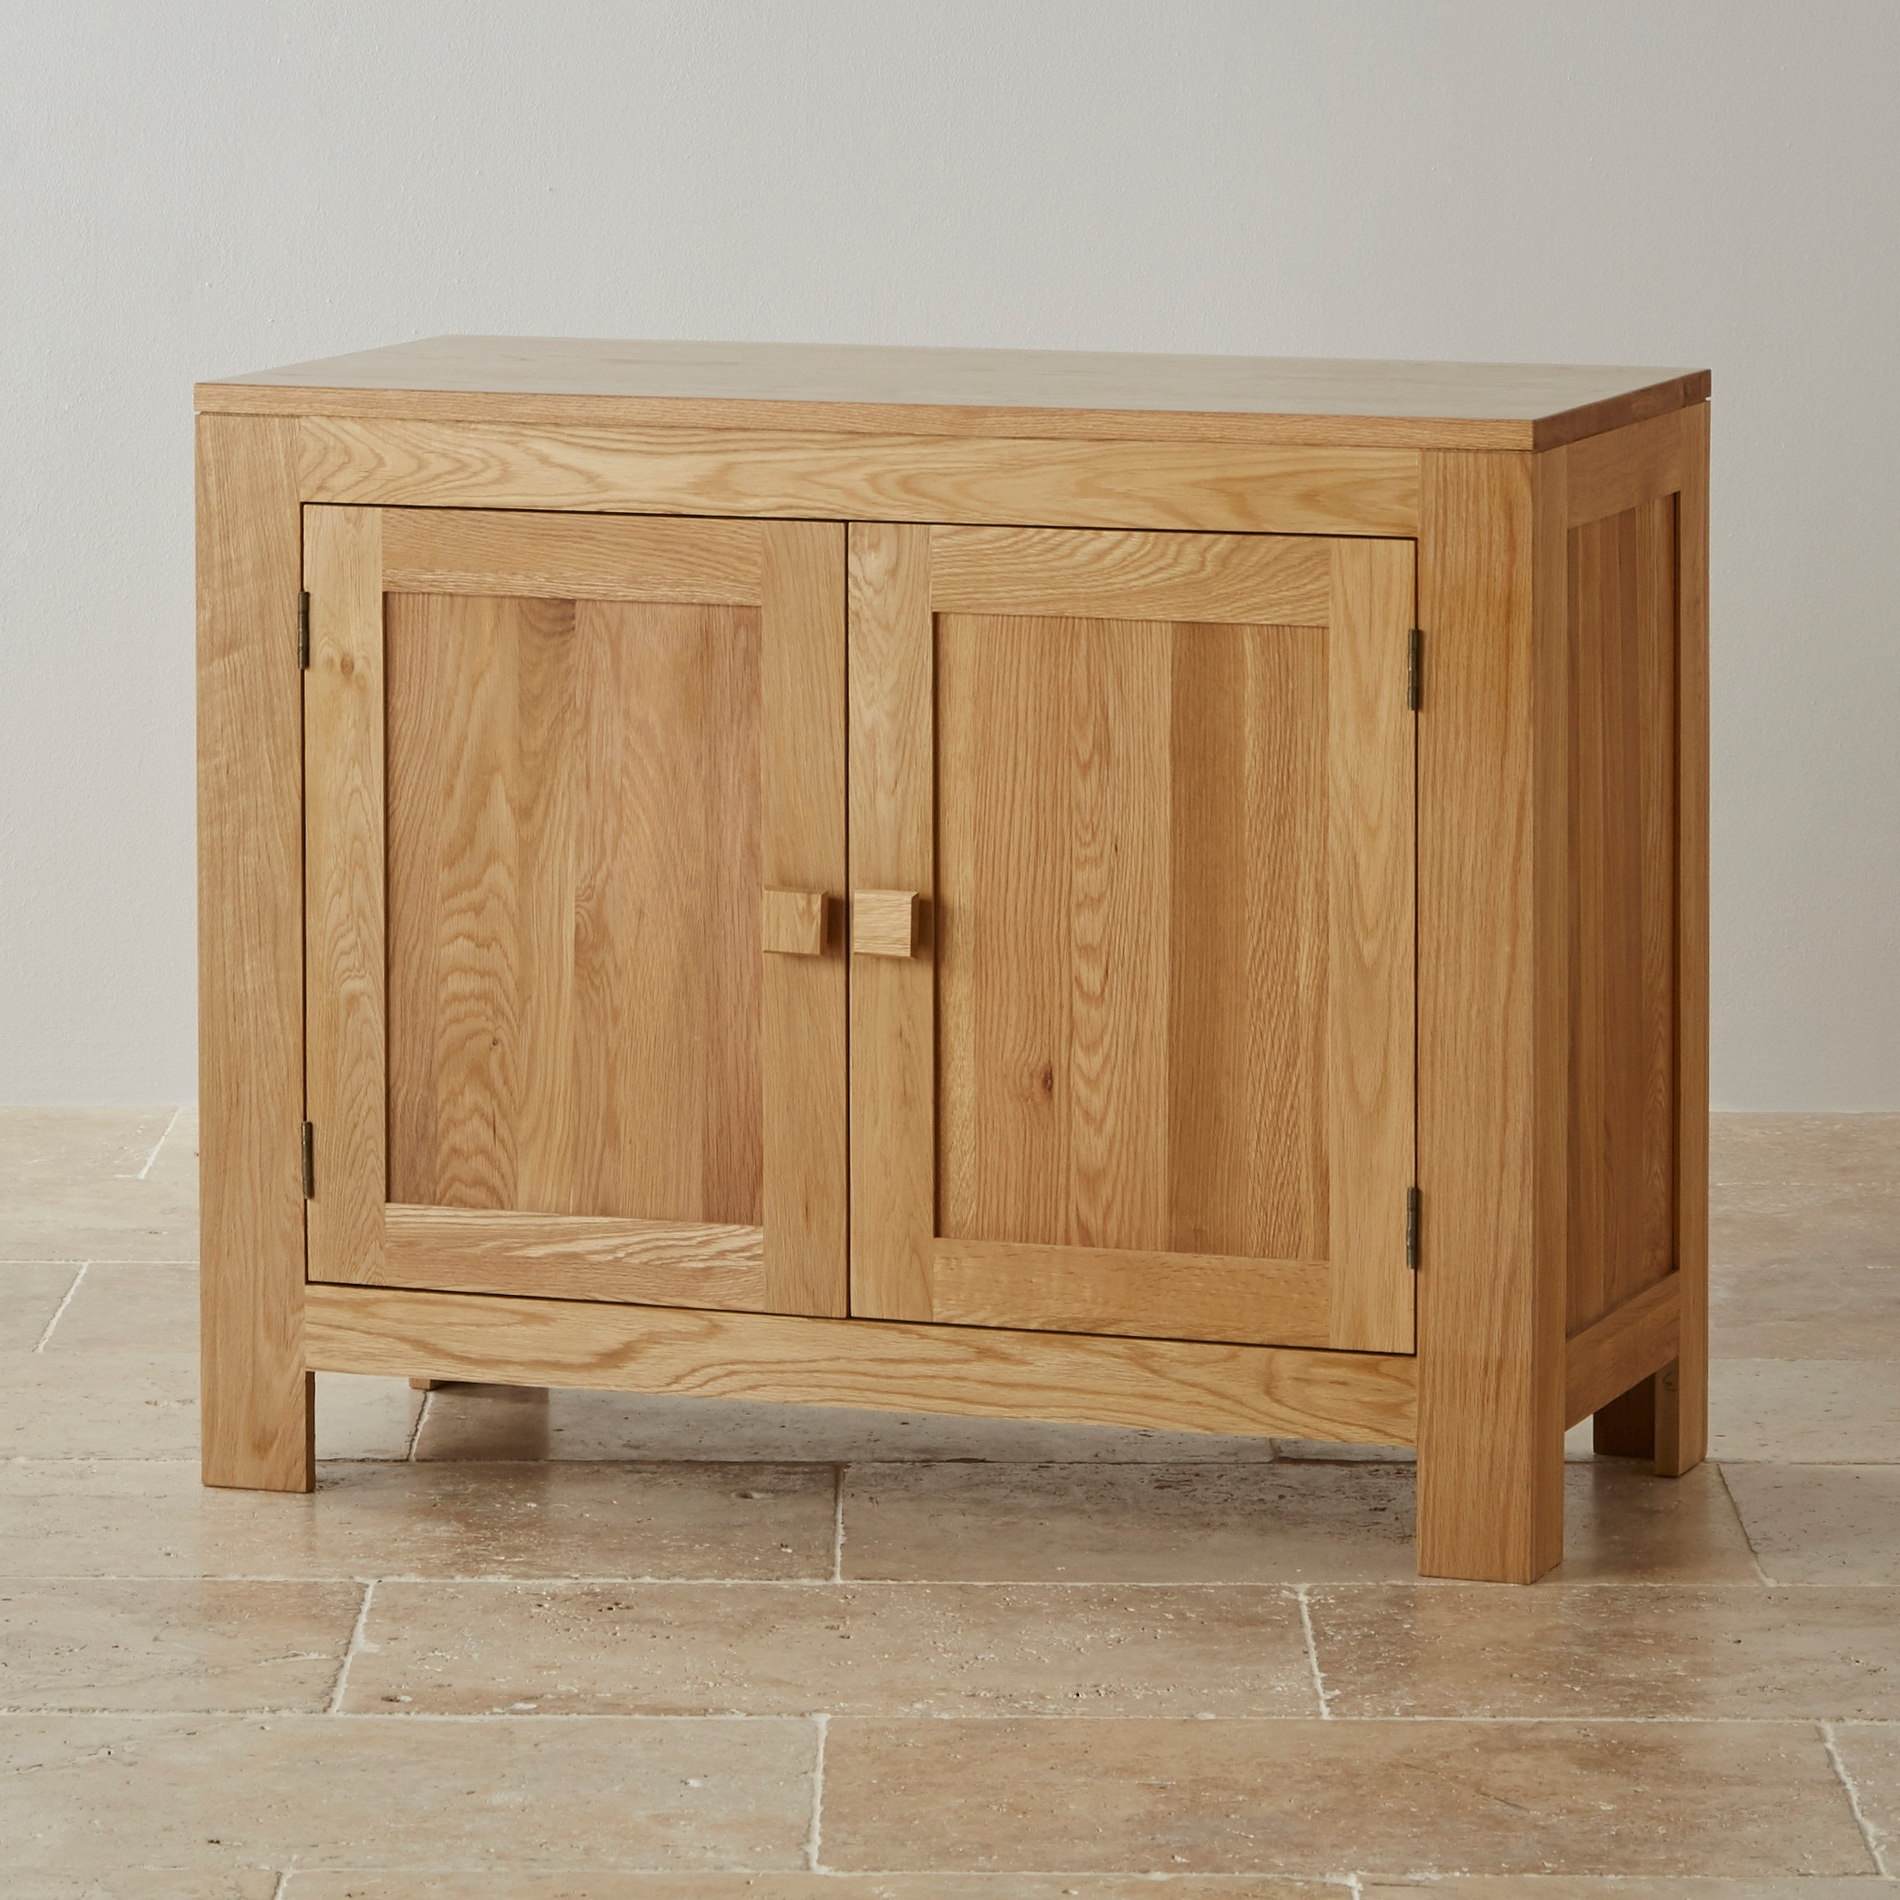 Oak Furniture Land (View 14 of 15)